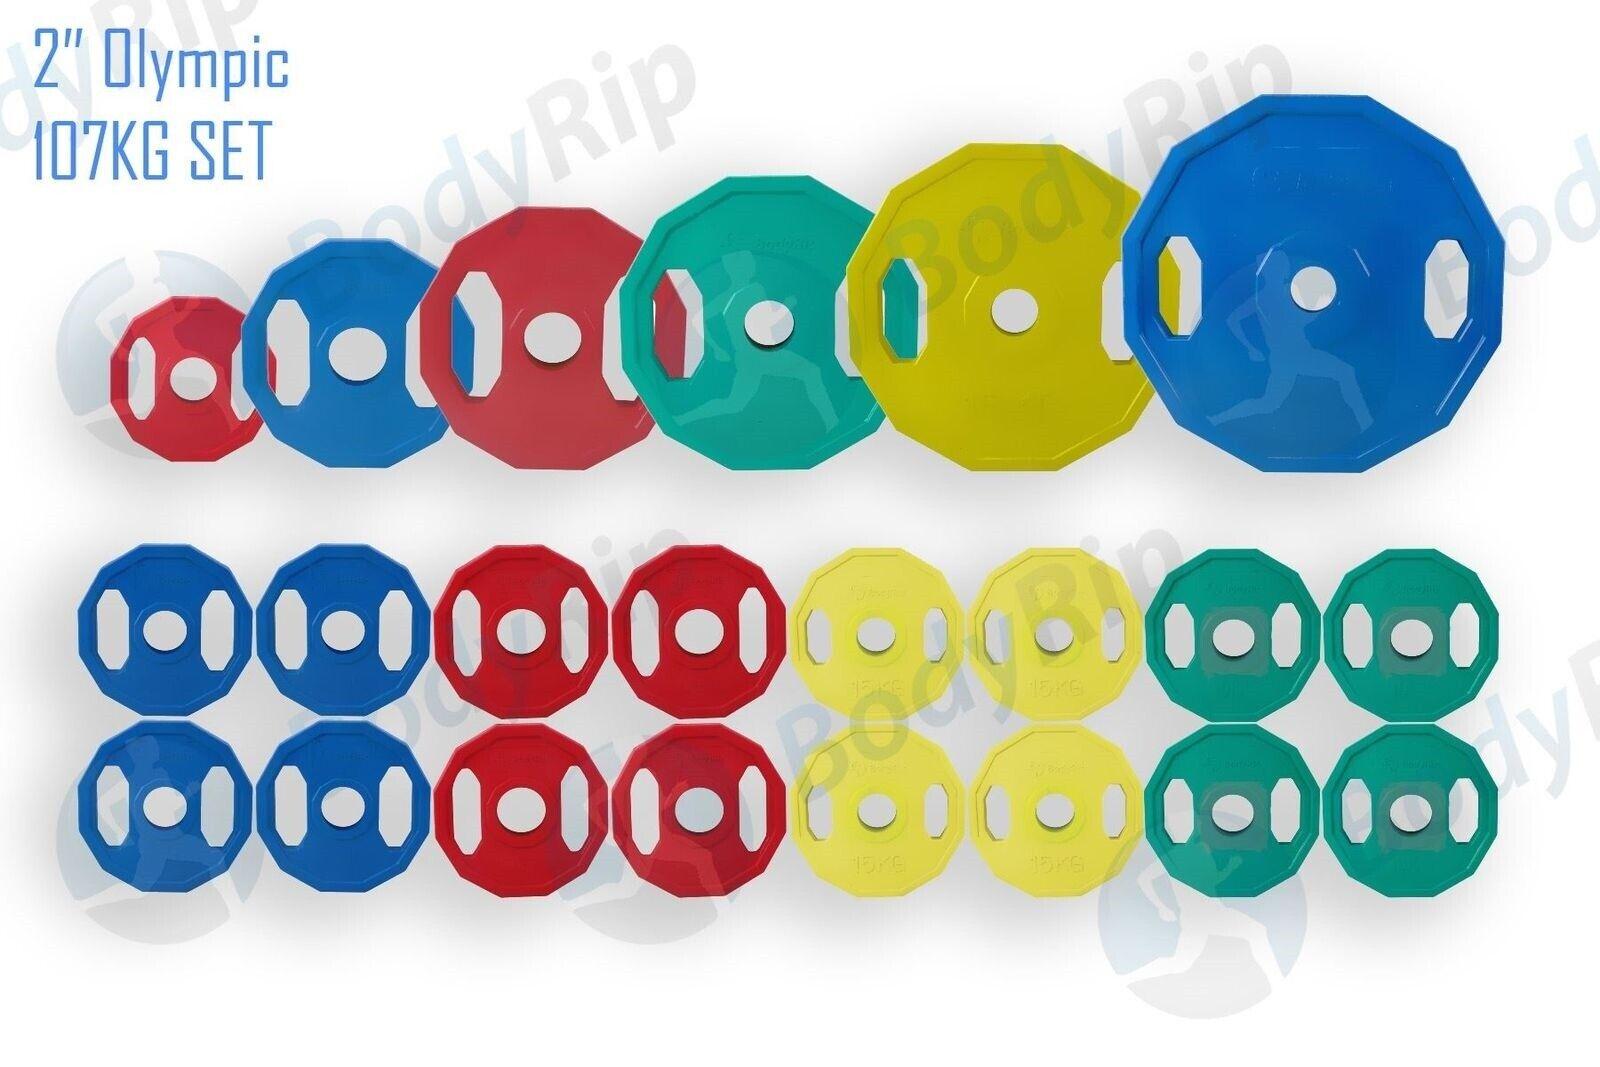 Olimpico Poligonali Peso Piastre Set 107kg │ 2  Disco Palestra Codice Coloreee By